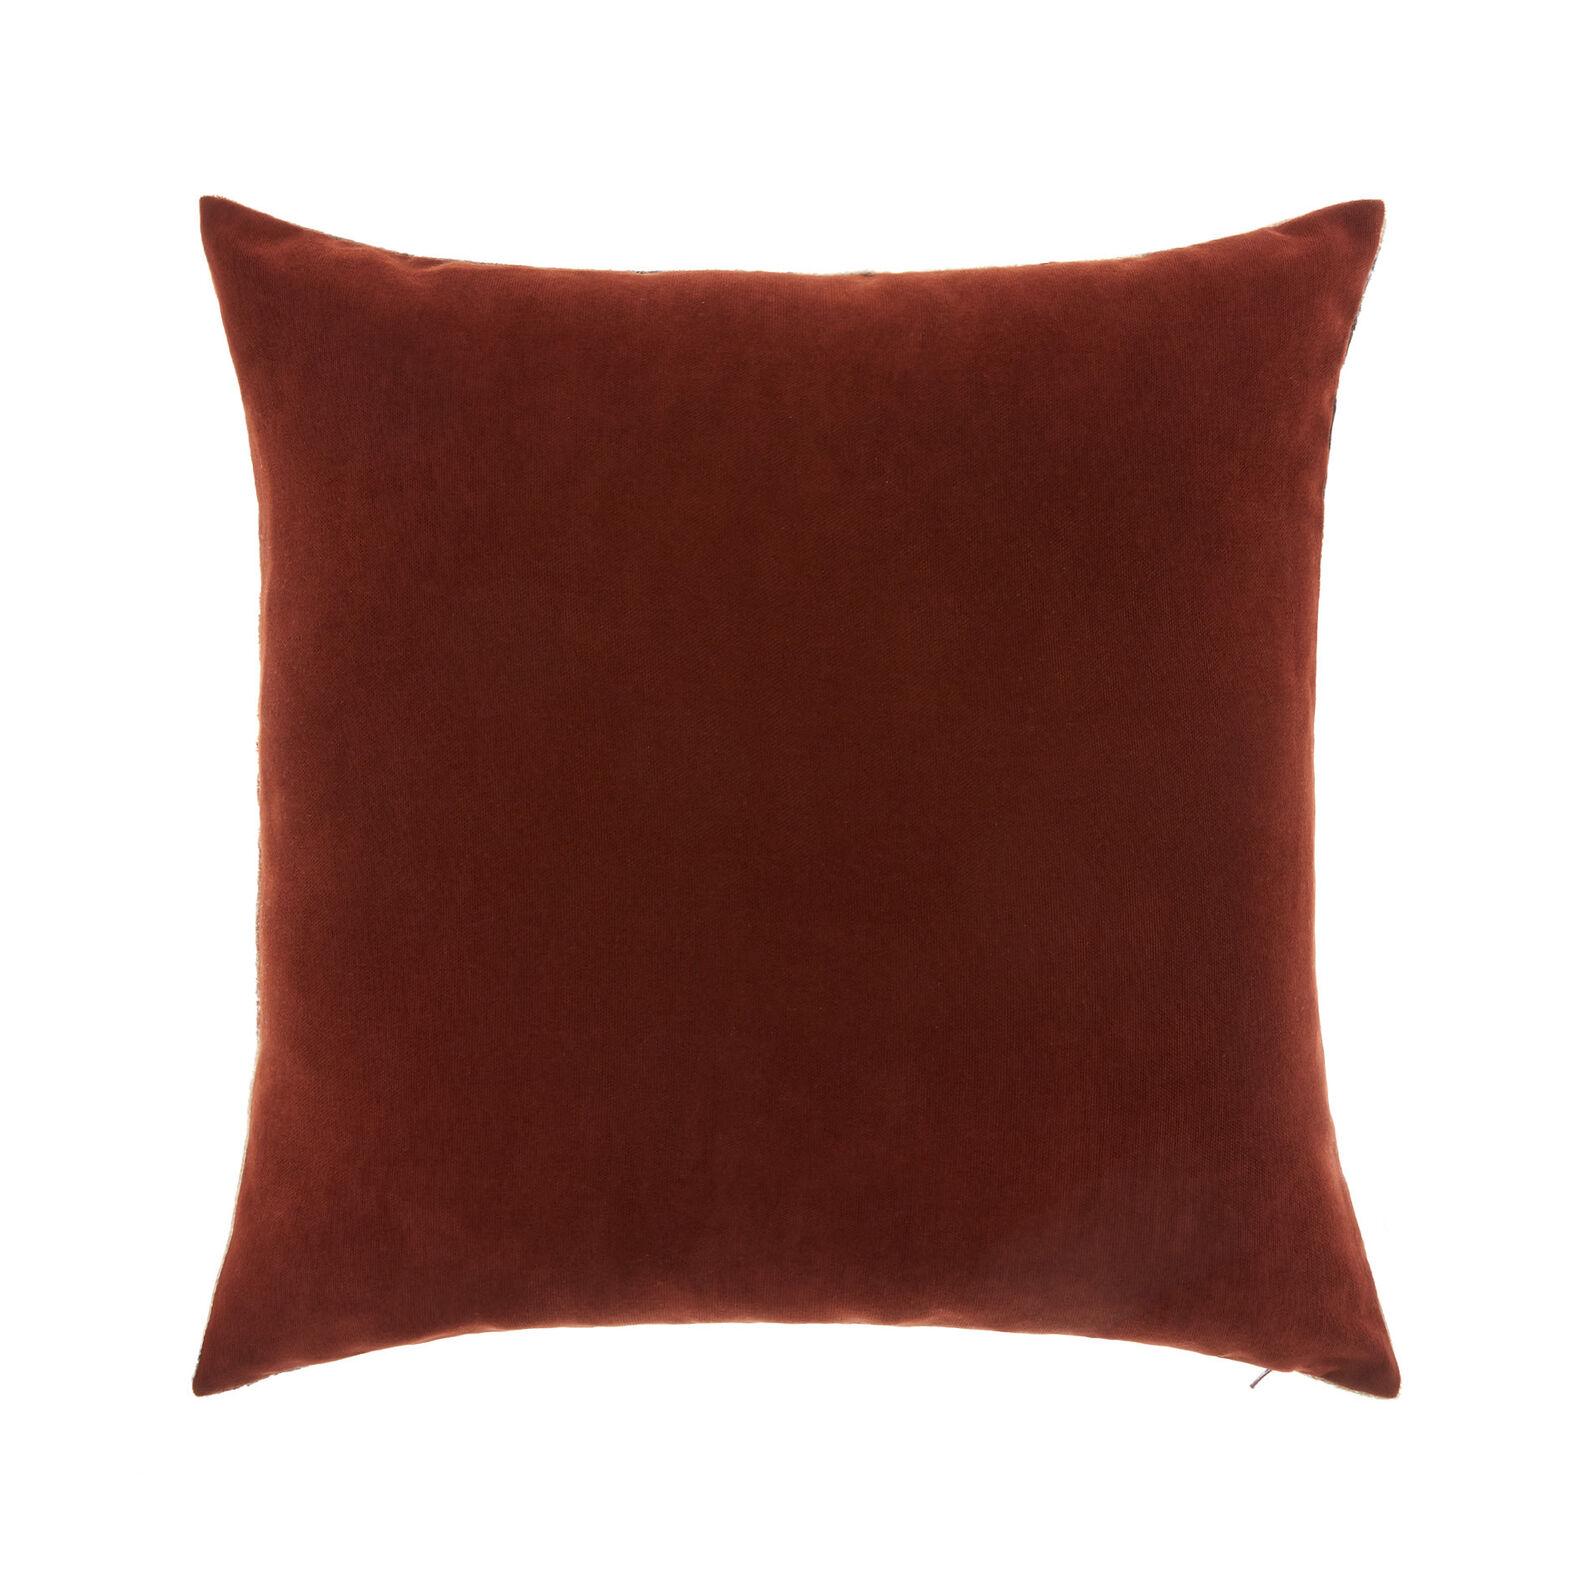 Velvet cushion with geometric motif 45 x 45 cm